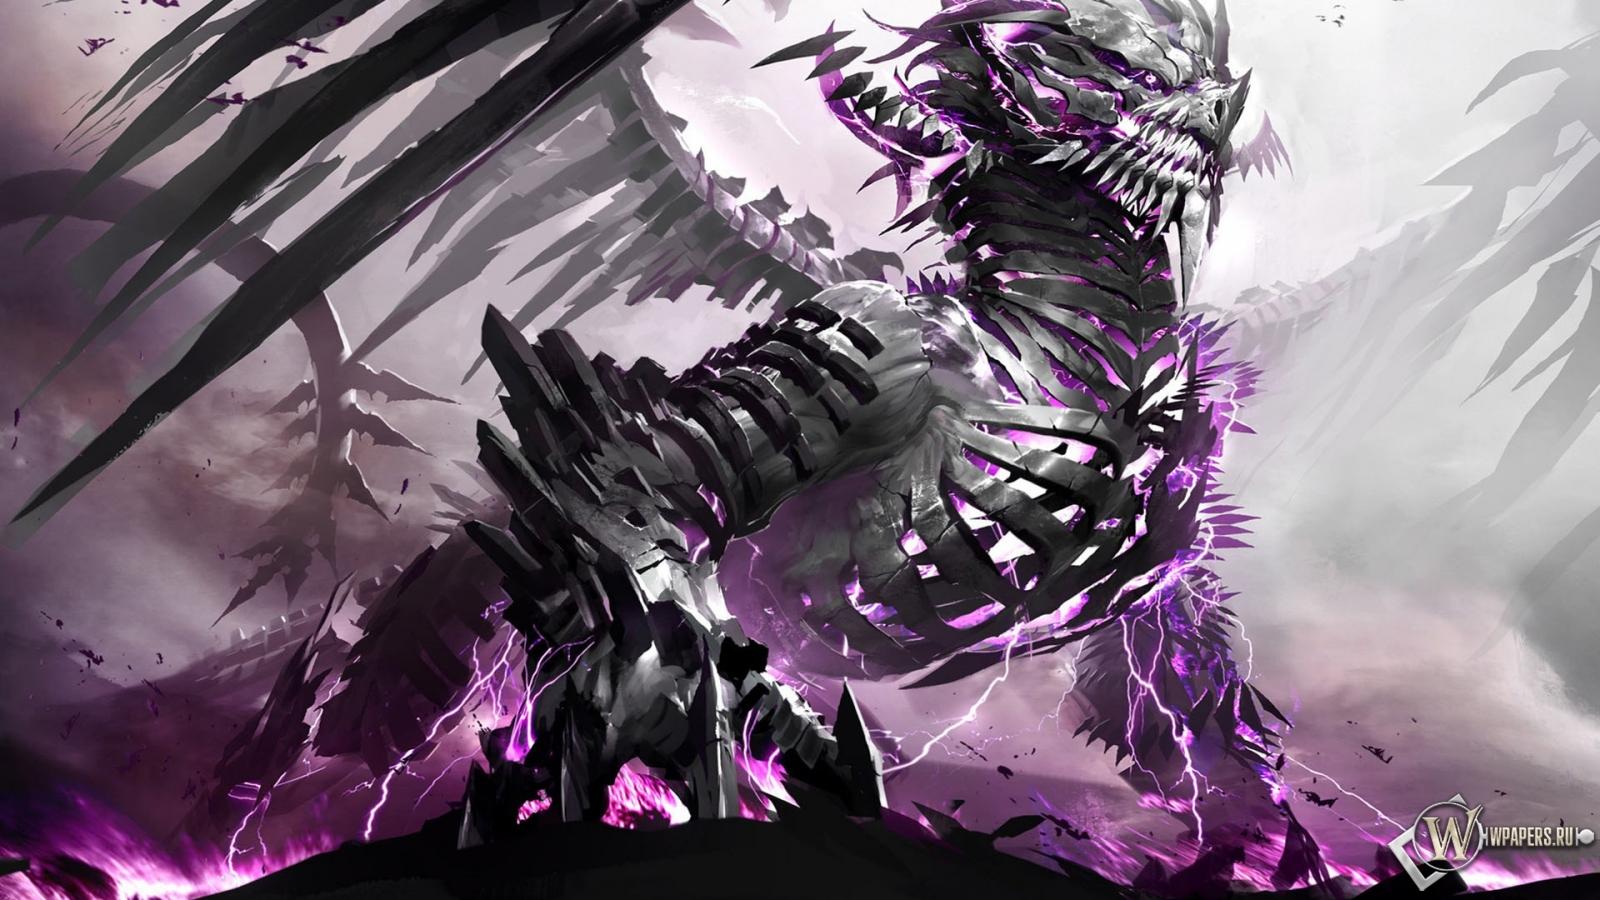 Дракон дракон обоев 51 монстр обоев 58